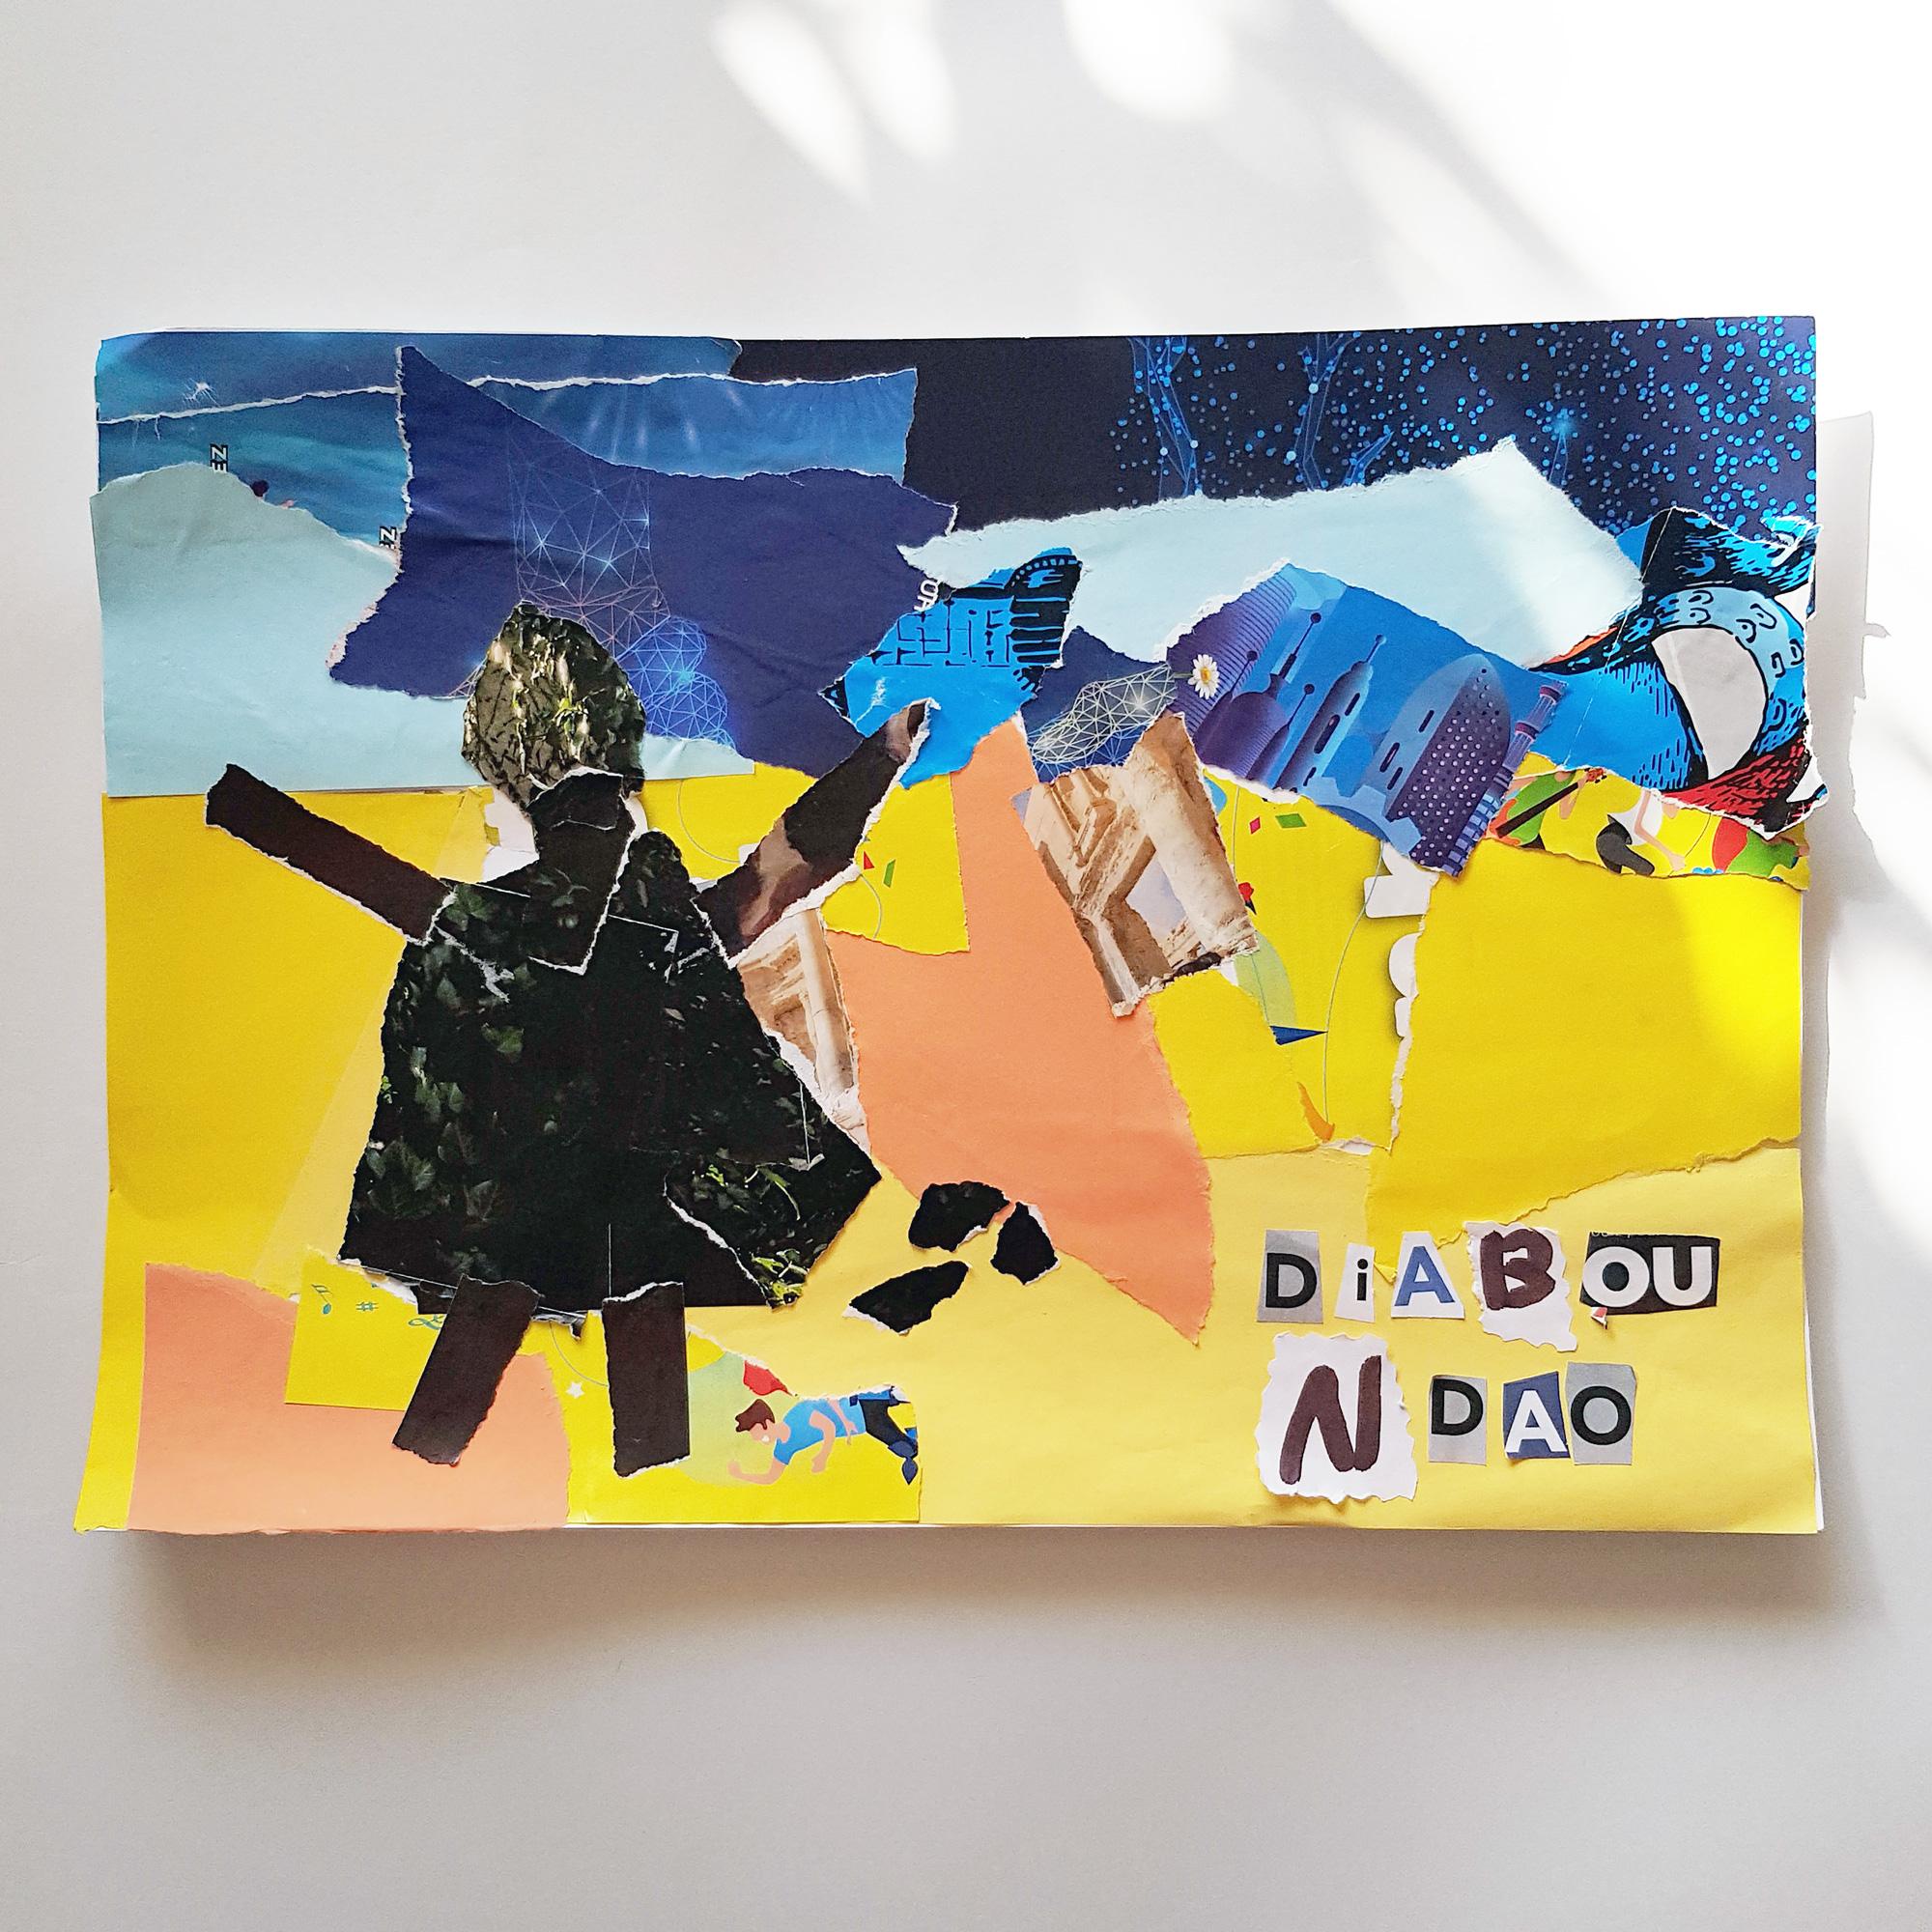 Atelier Kamishibai d'après Diabou Ndao de Mamadou Diallo